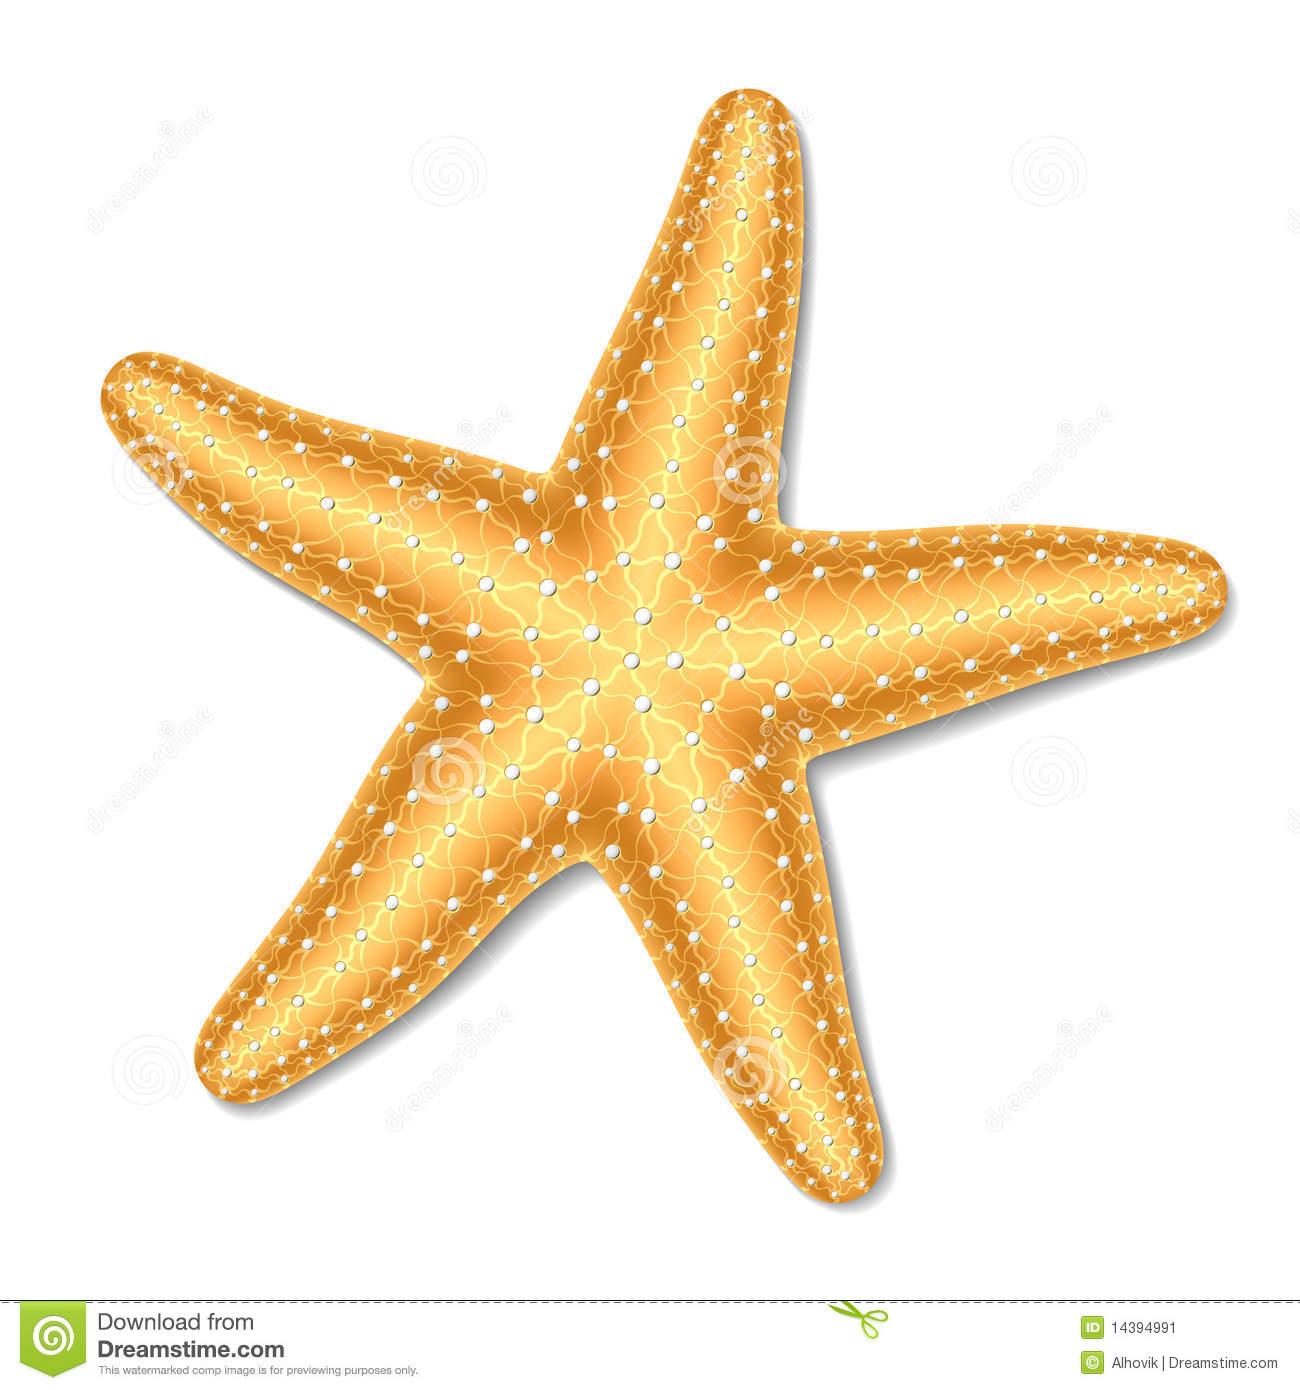 Images of Starfish | 1300x1390